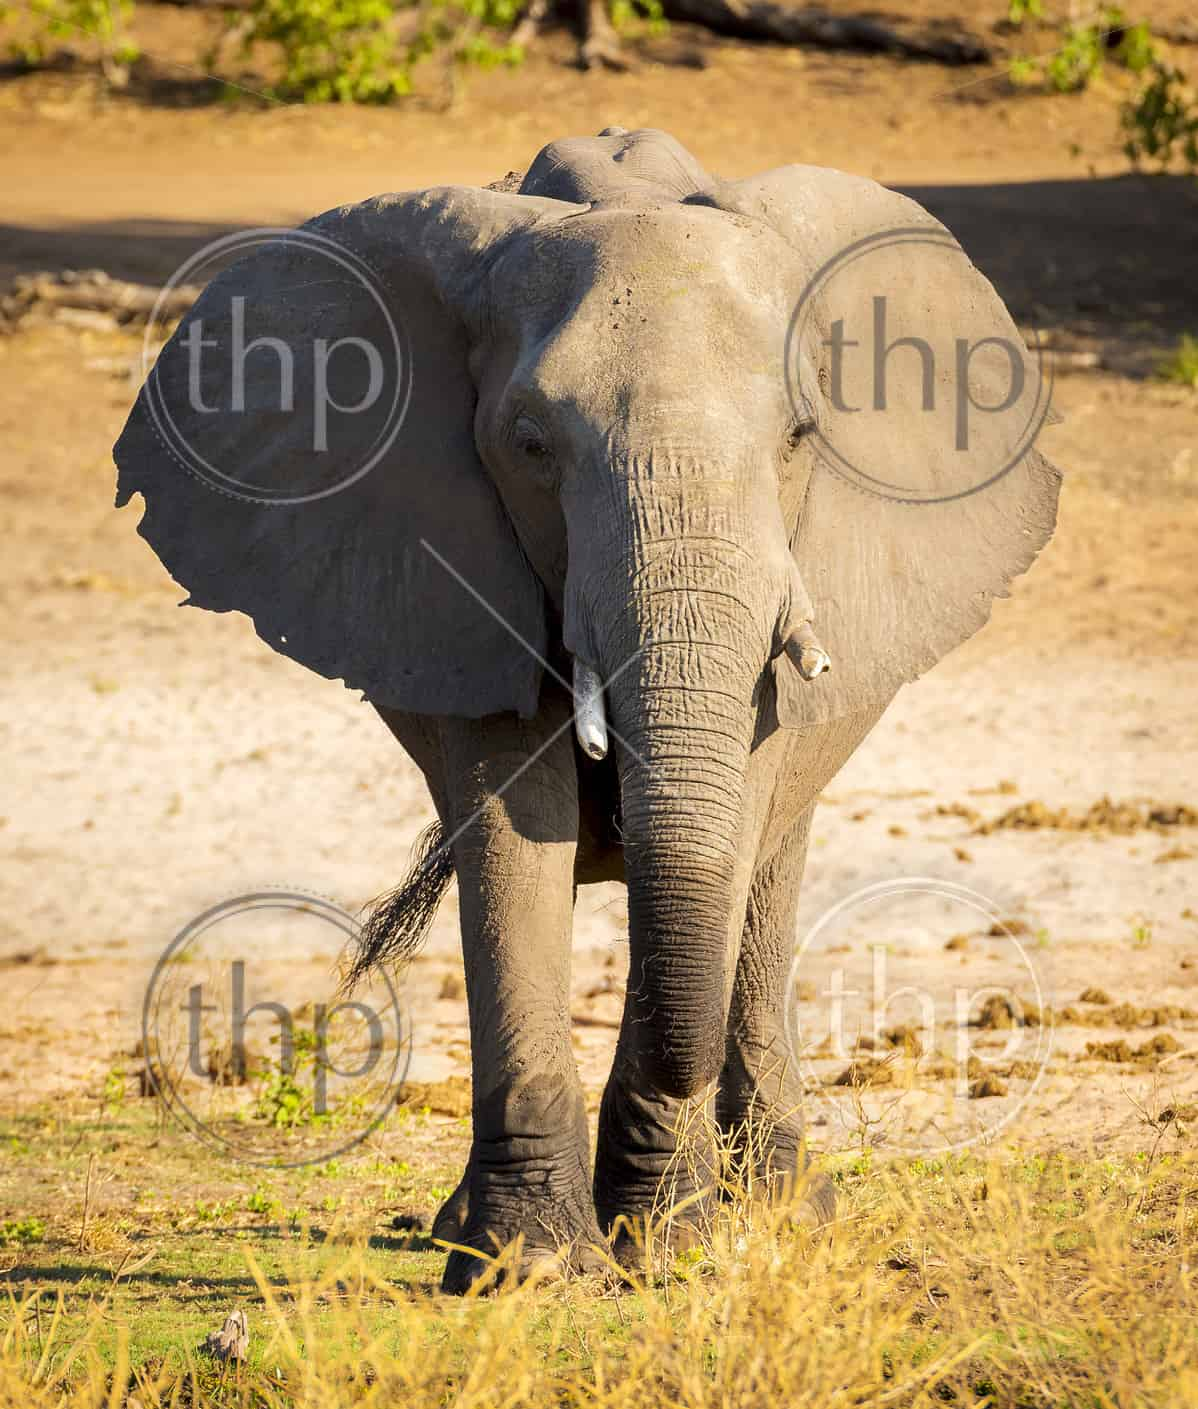 Elephant in Chobe National Park, Botswana, Africa